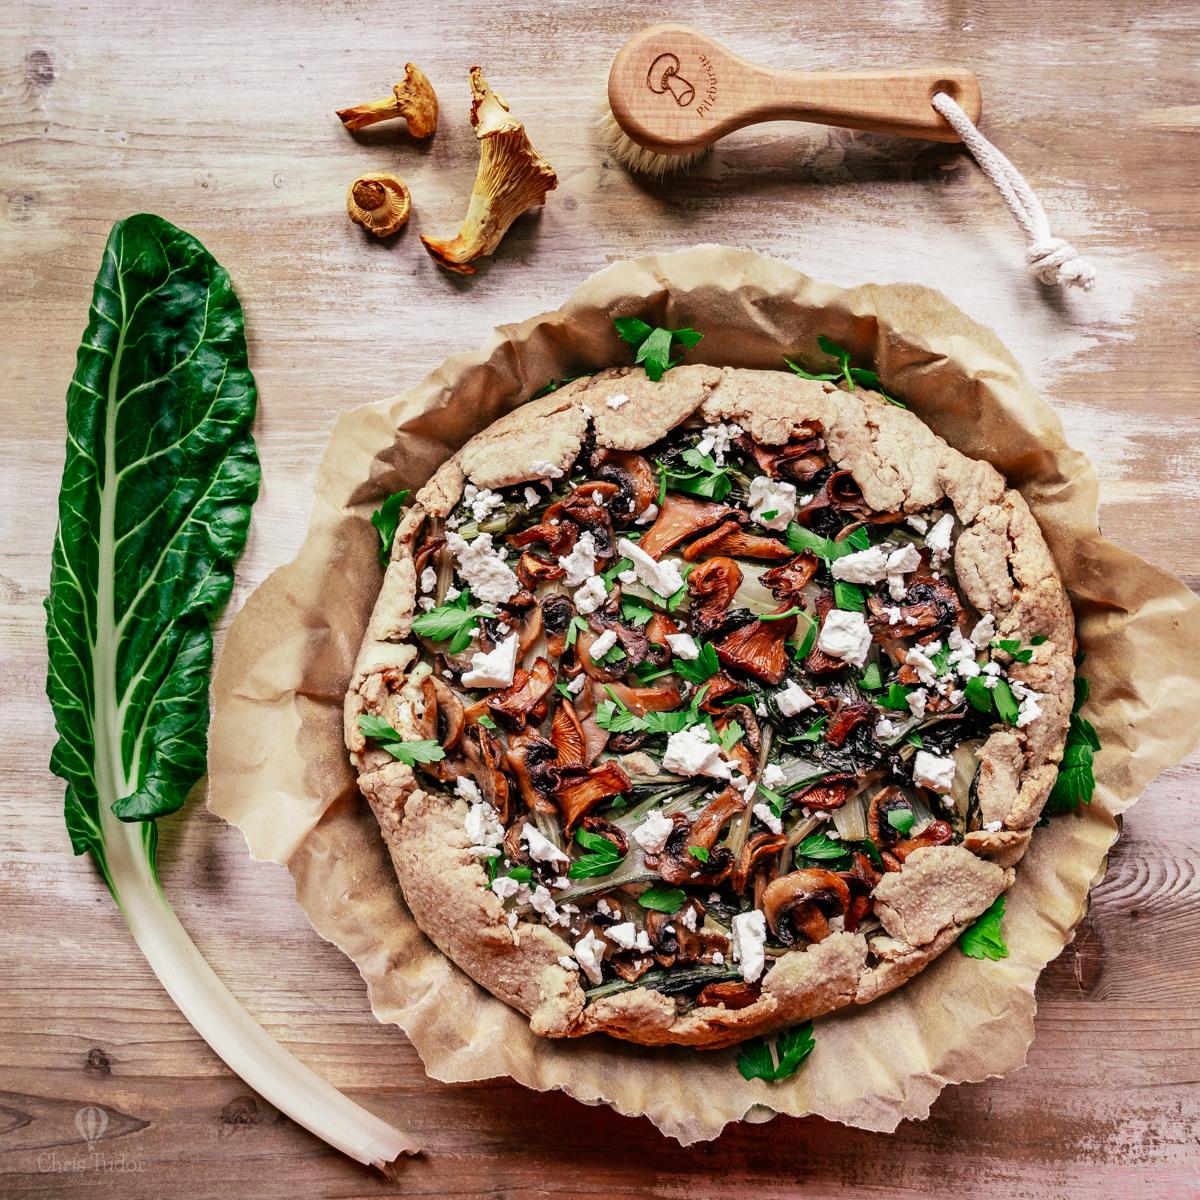 cristina-tudor-food-photography (56).jpg